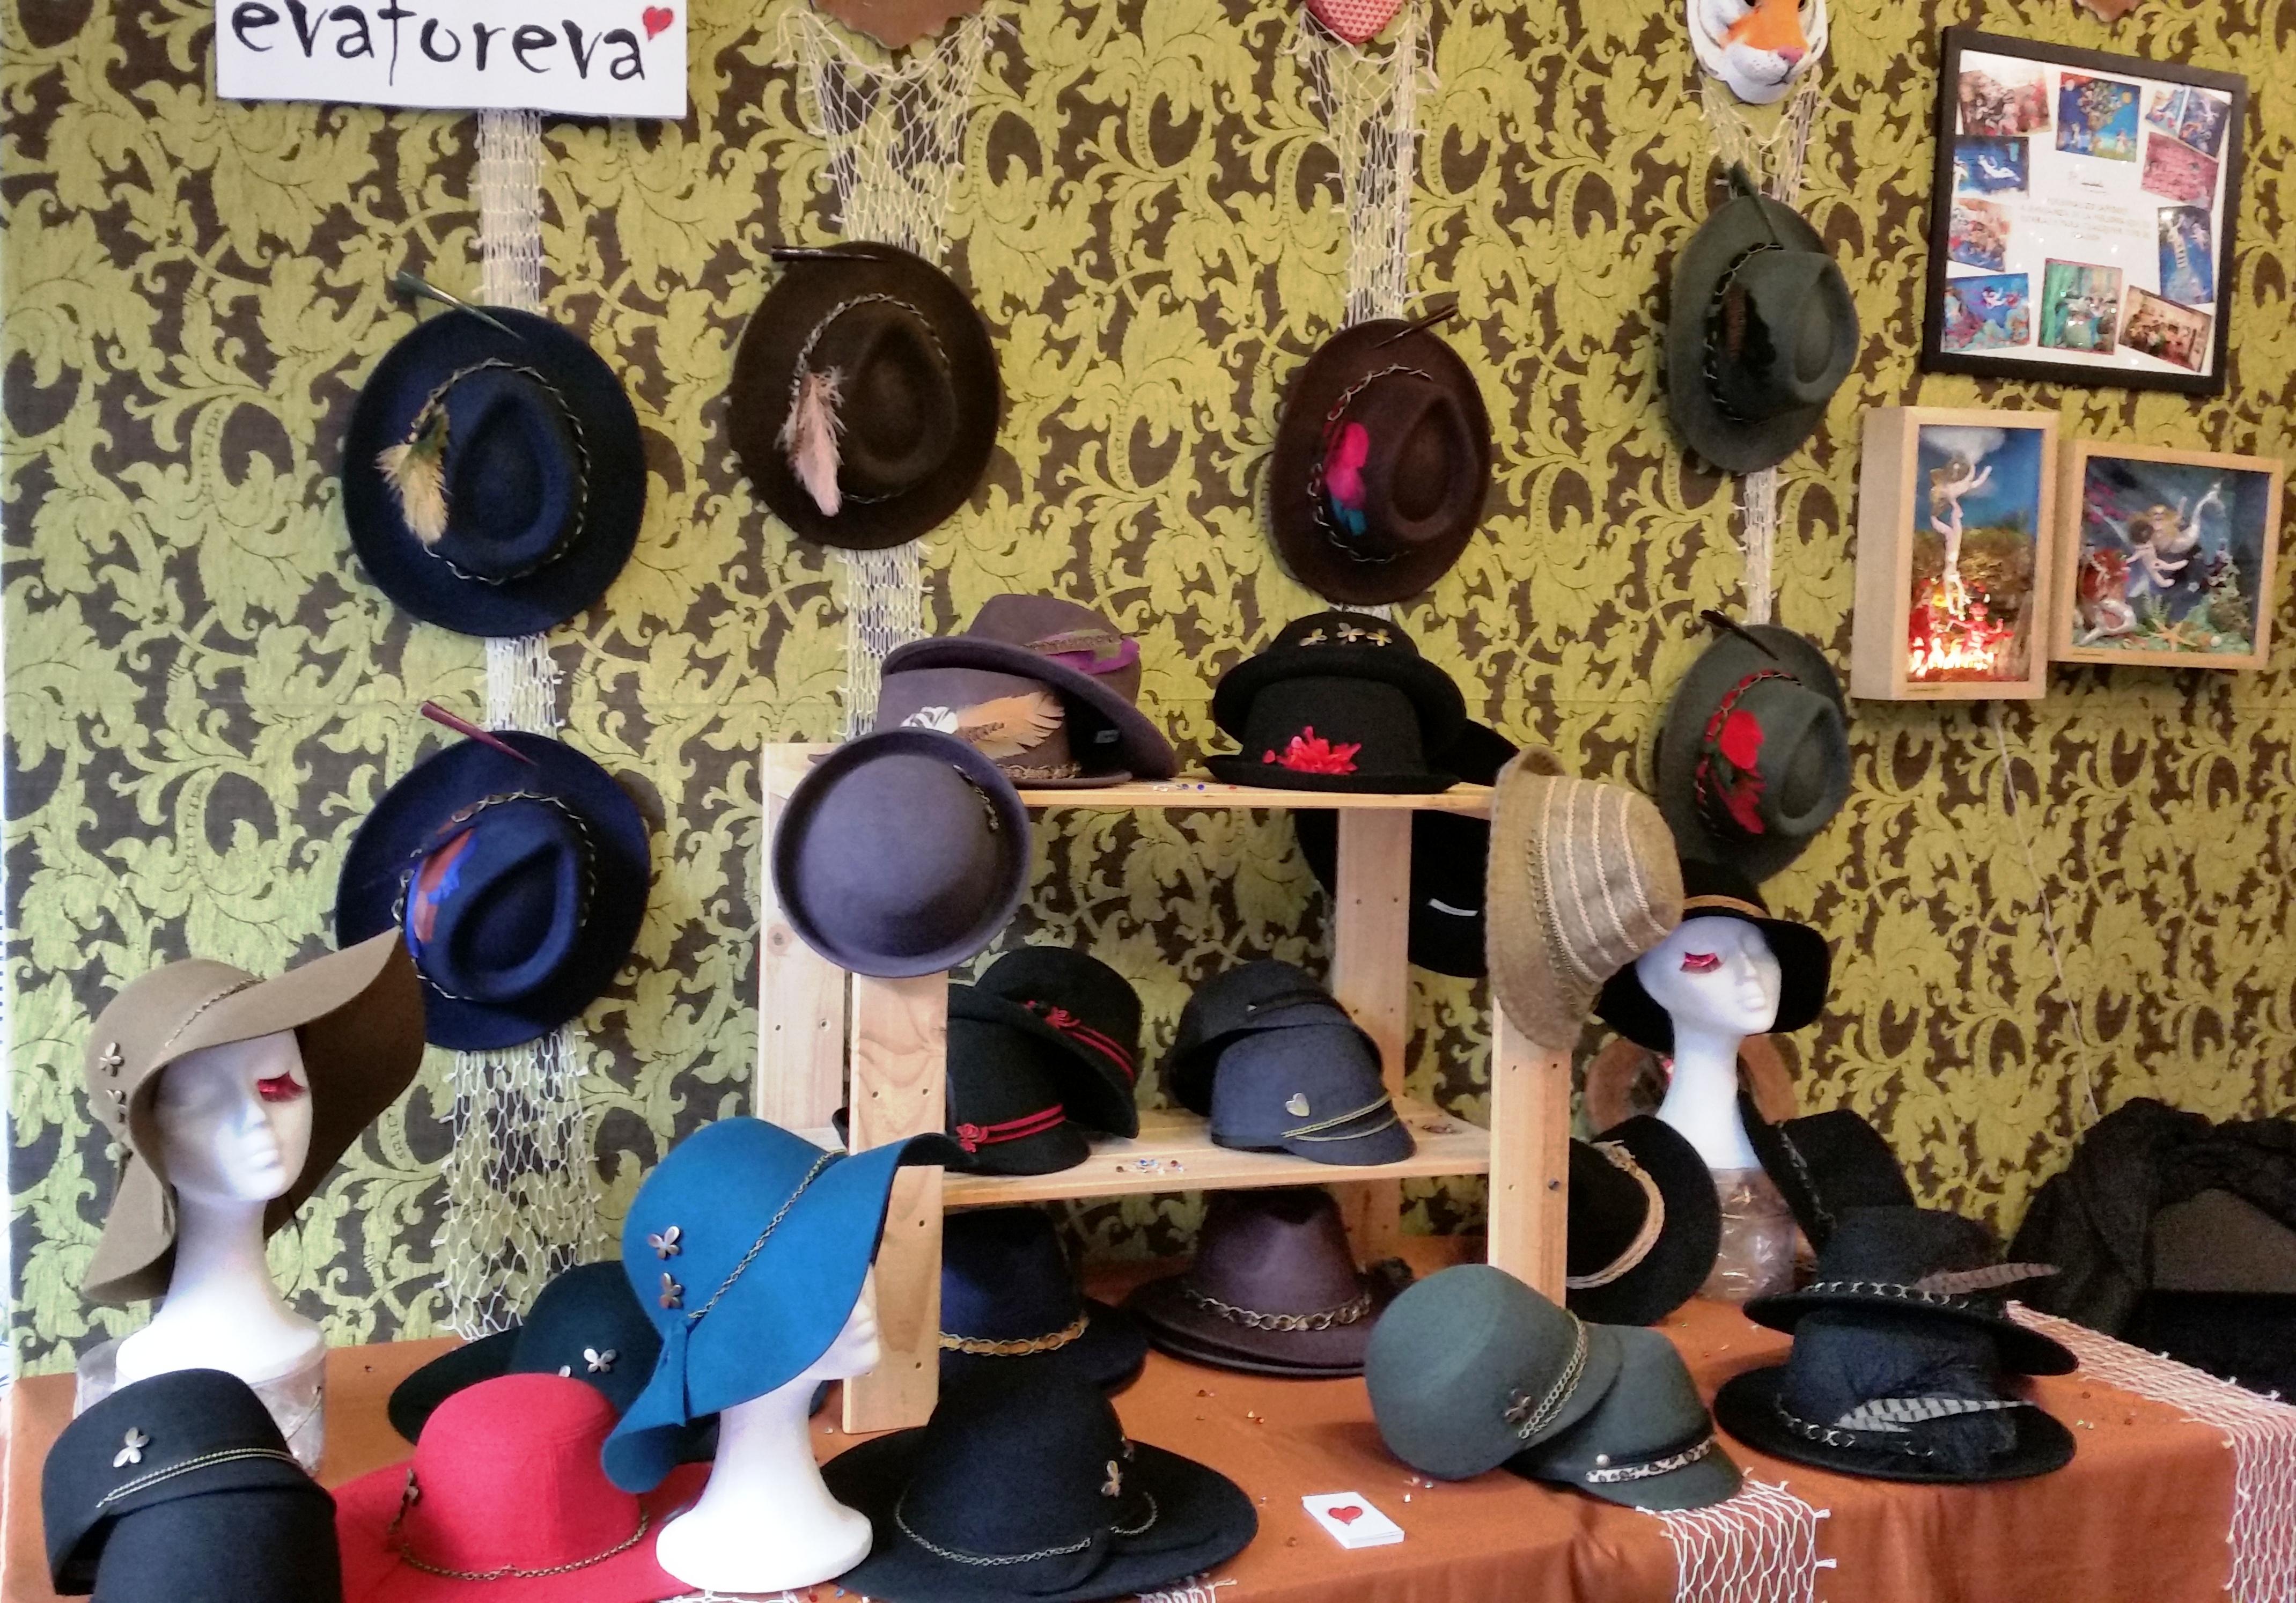 evaforeva (sombreros)